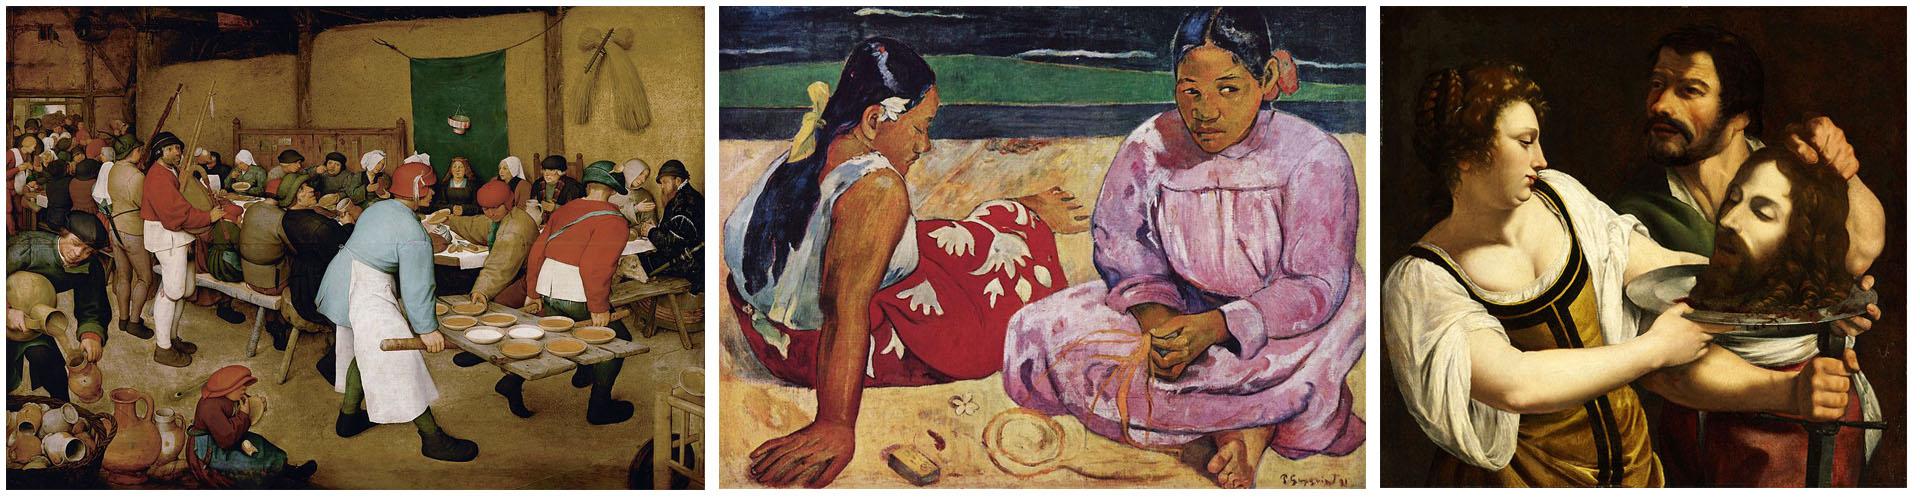 GauguinBrueghelyArtemisia